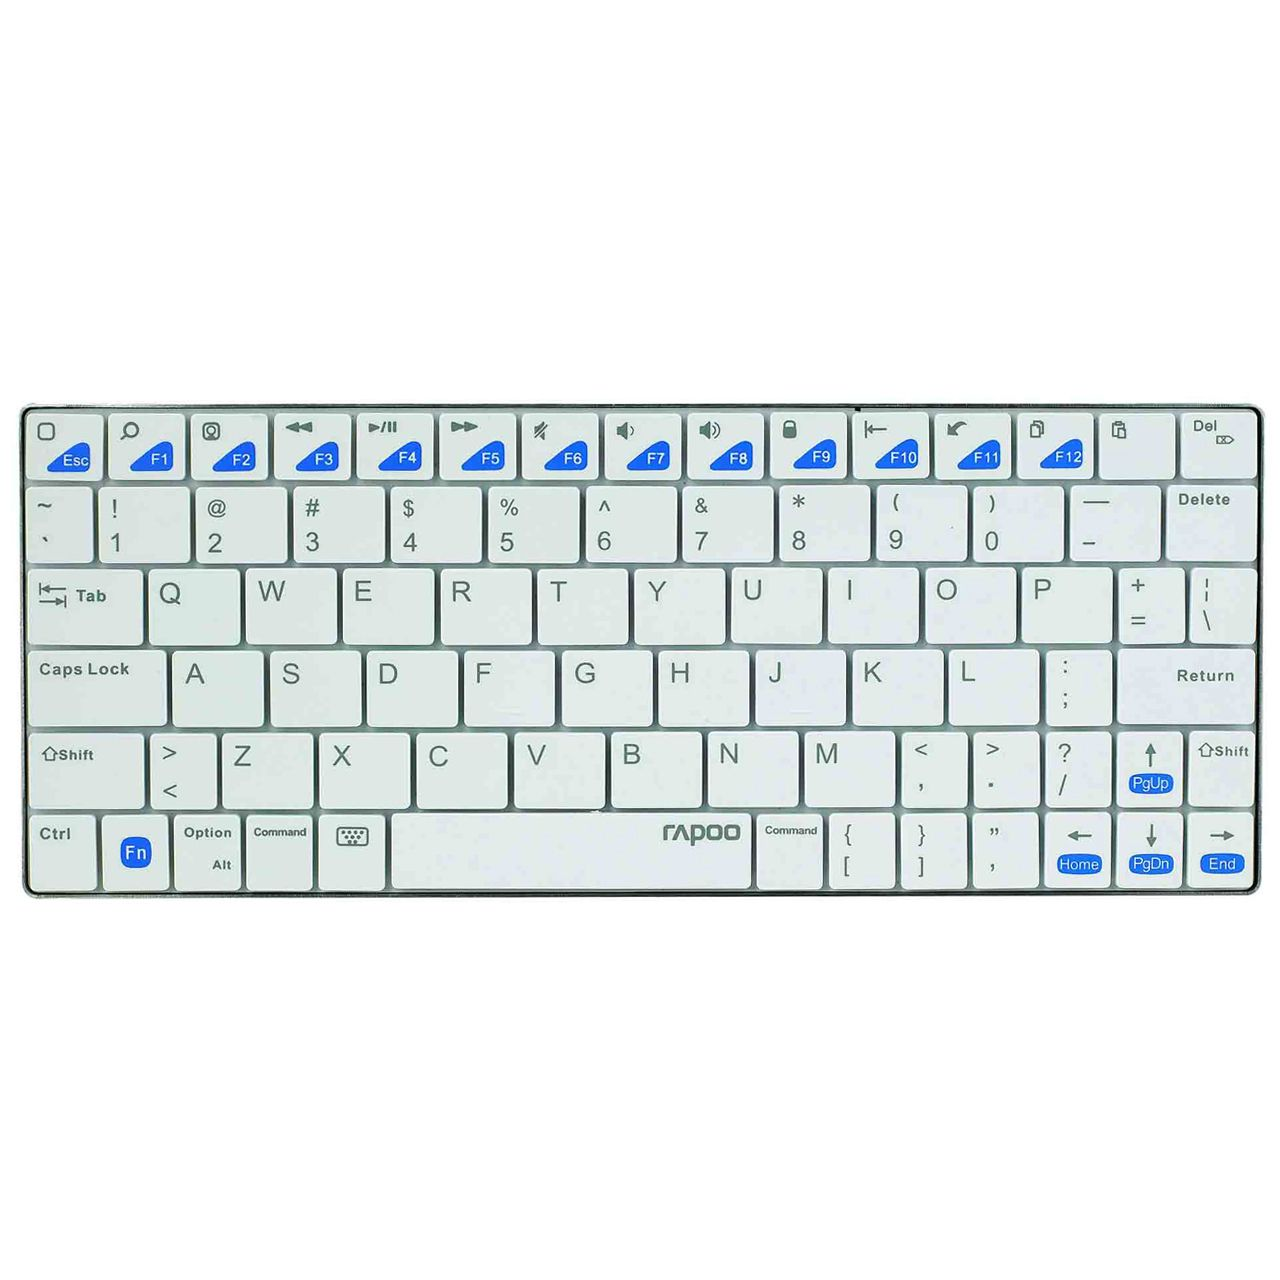 rapoo tablet keyboard e6300 toetsenbord ERKAESTZ01 Wit